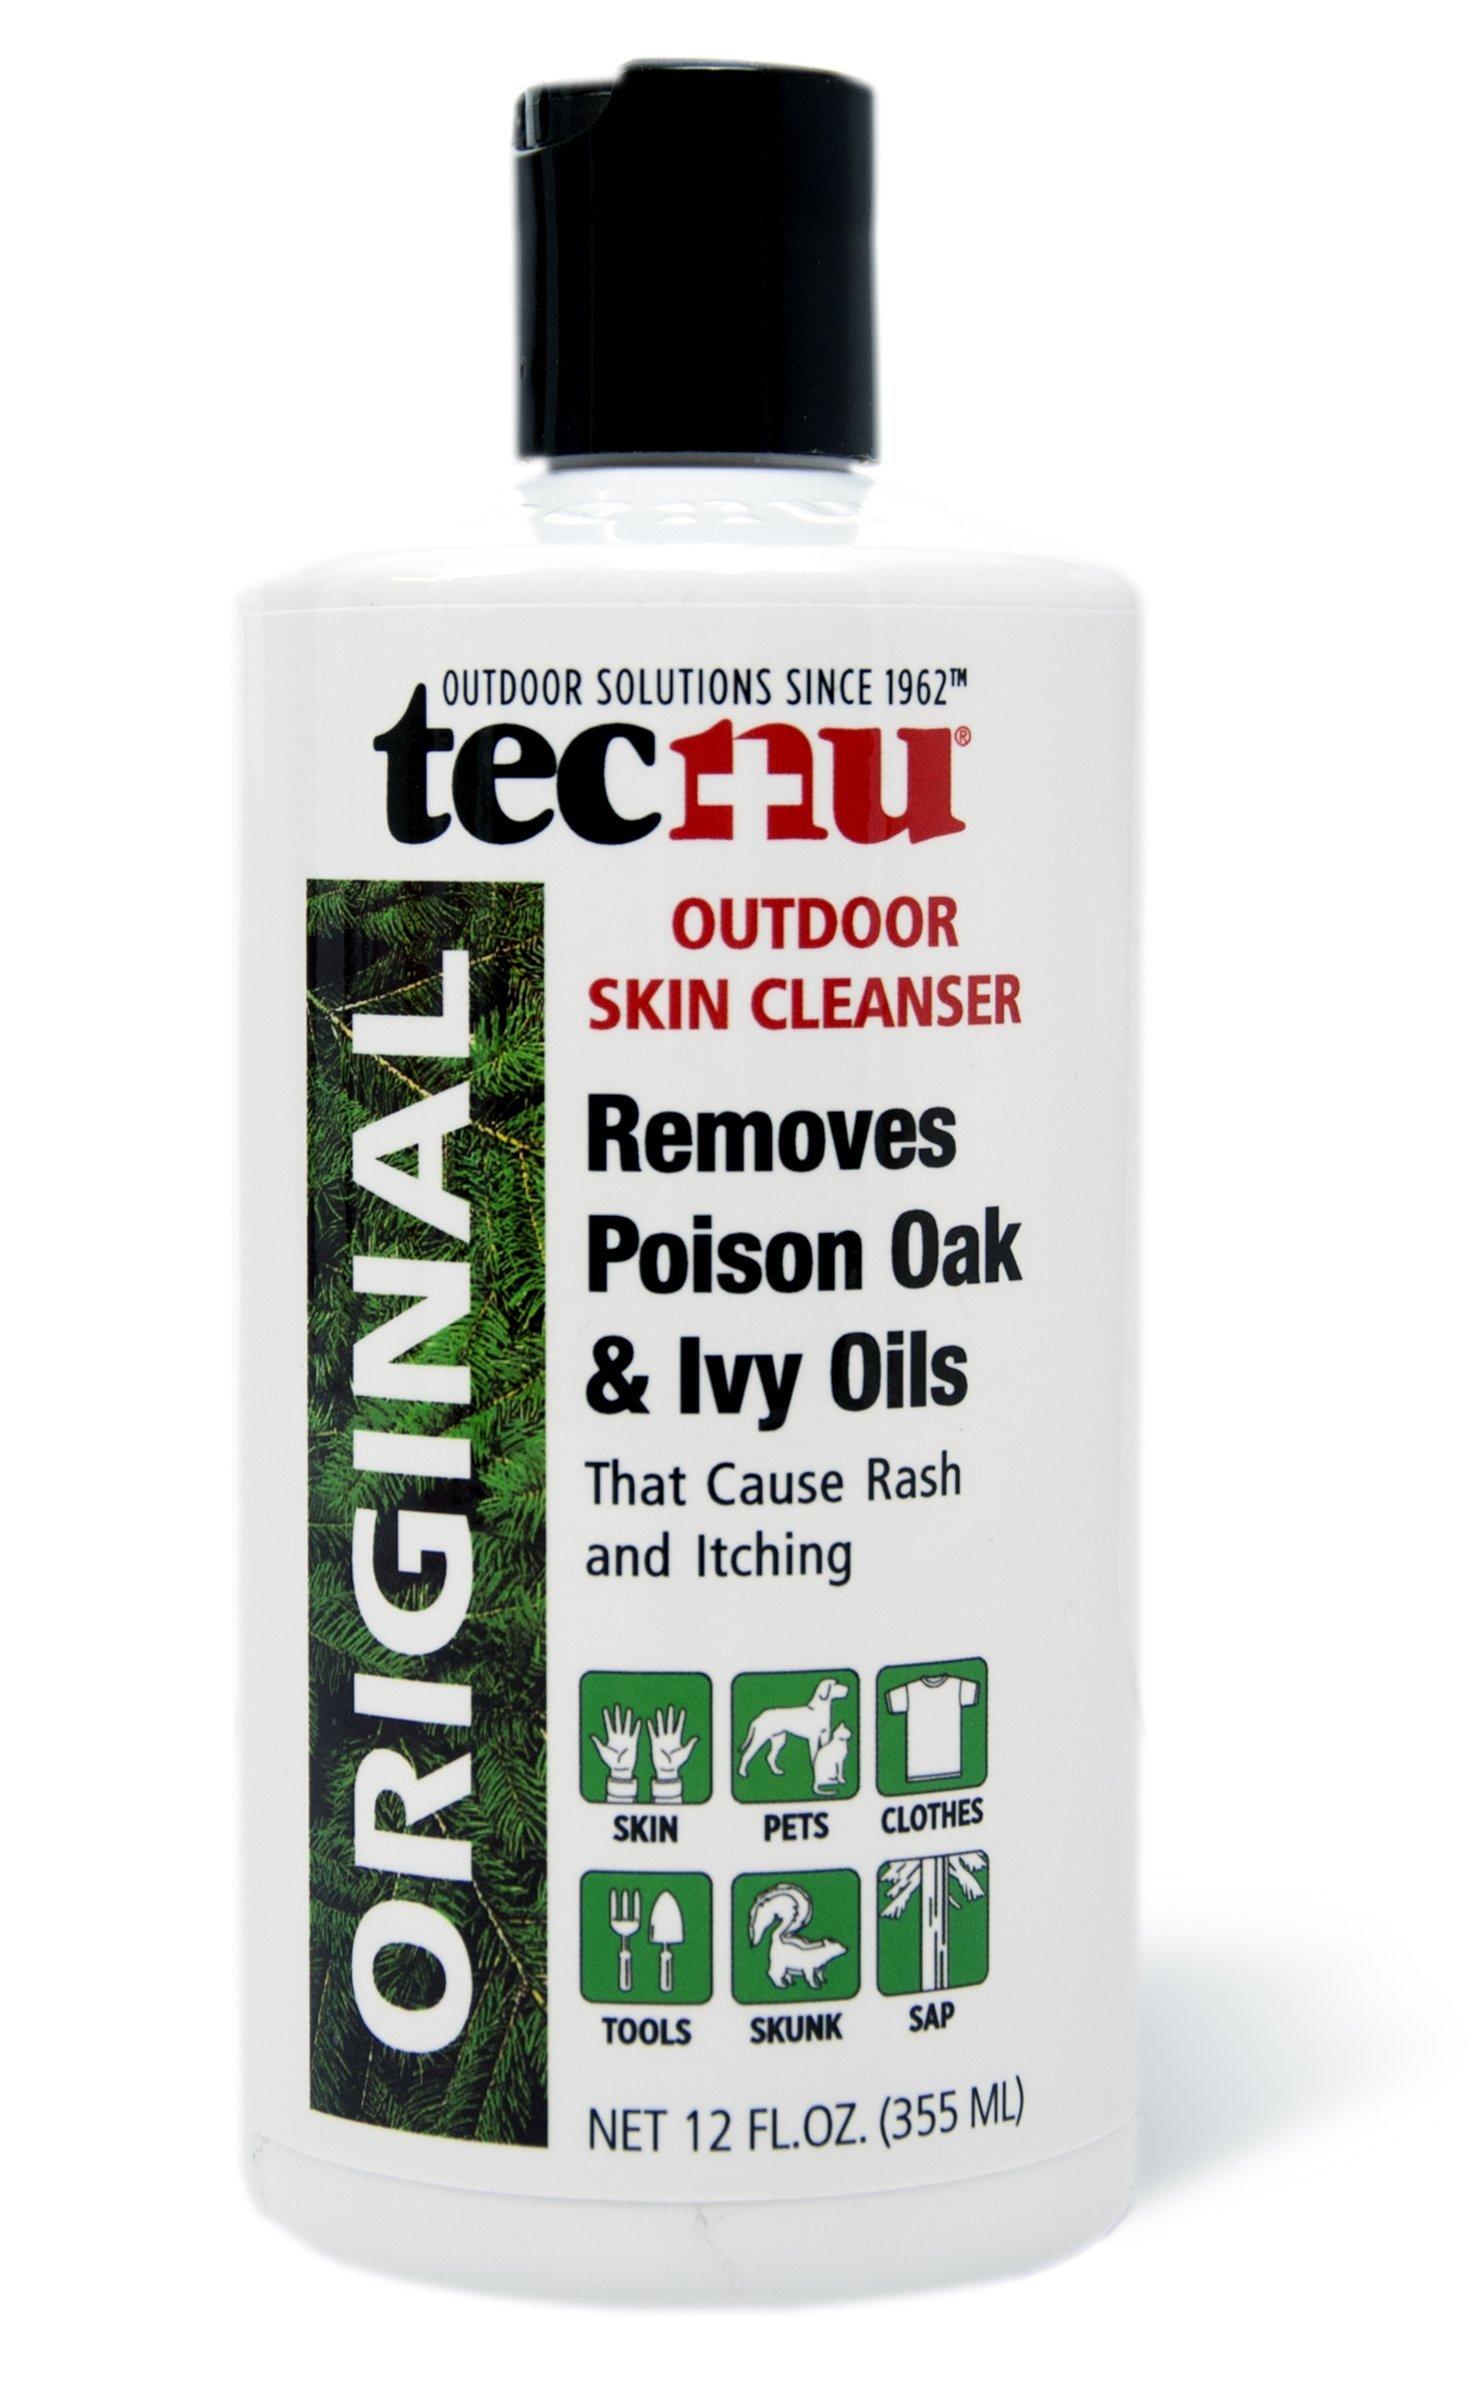 Tecnu Original Poison Oak & Ivy Outdoor Skin Cleanser, 12 Ounce